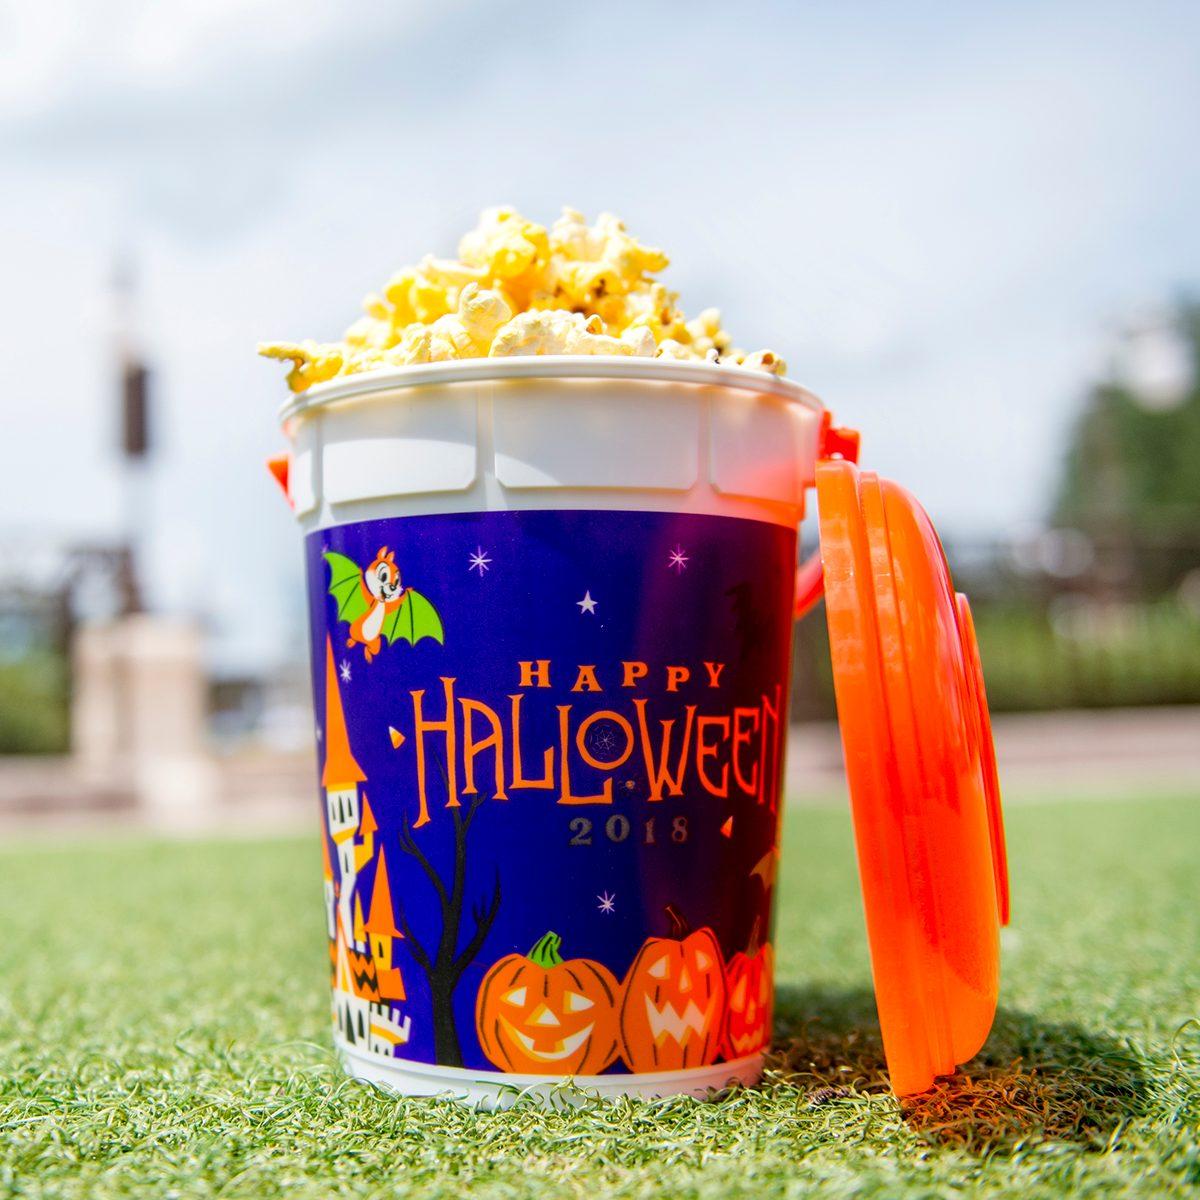 Popcorn in Disney-themed Halloween bucket